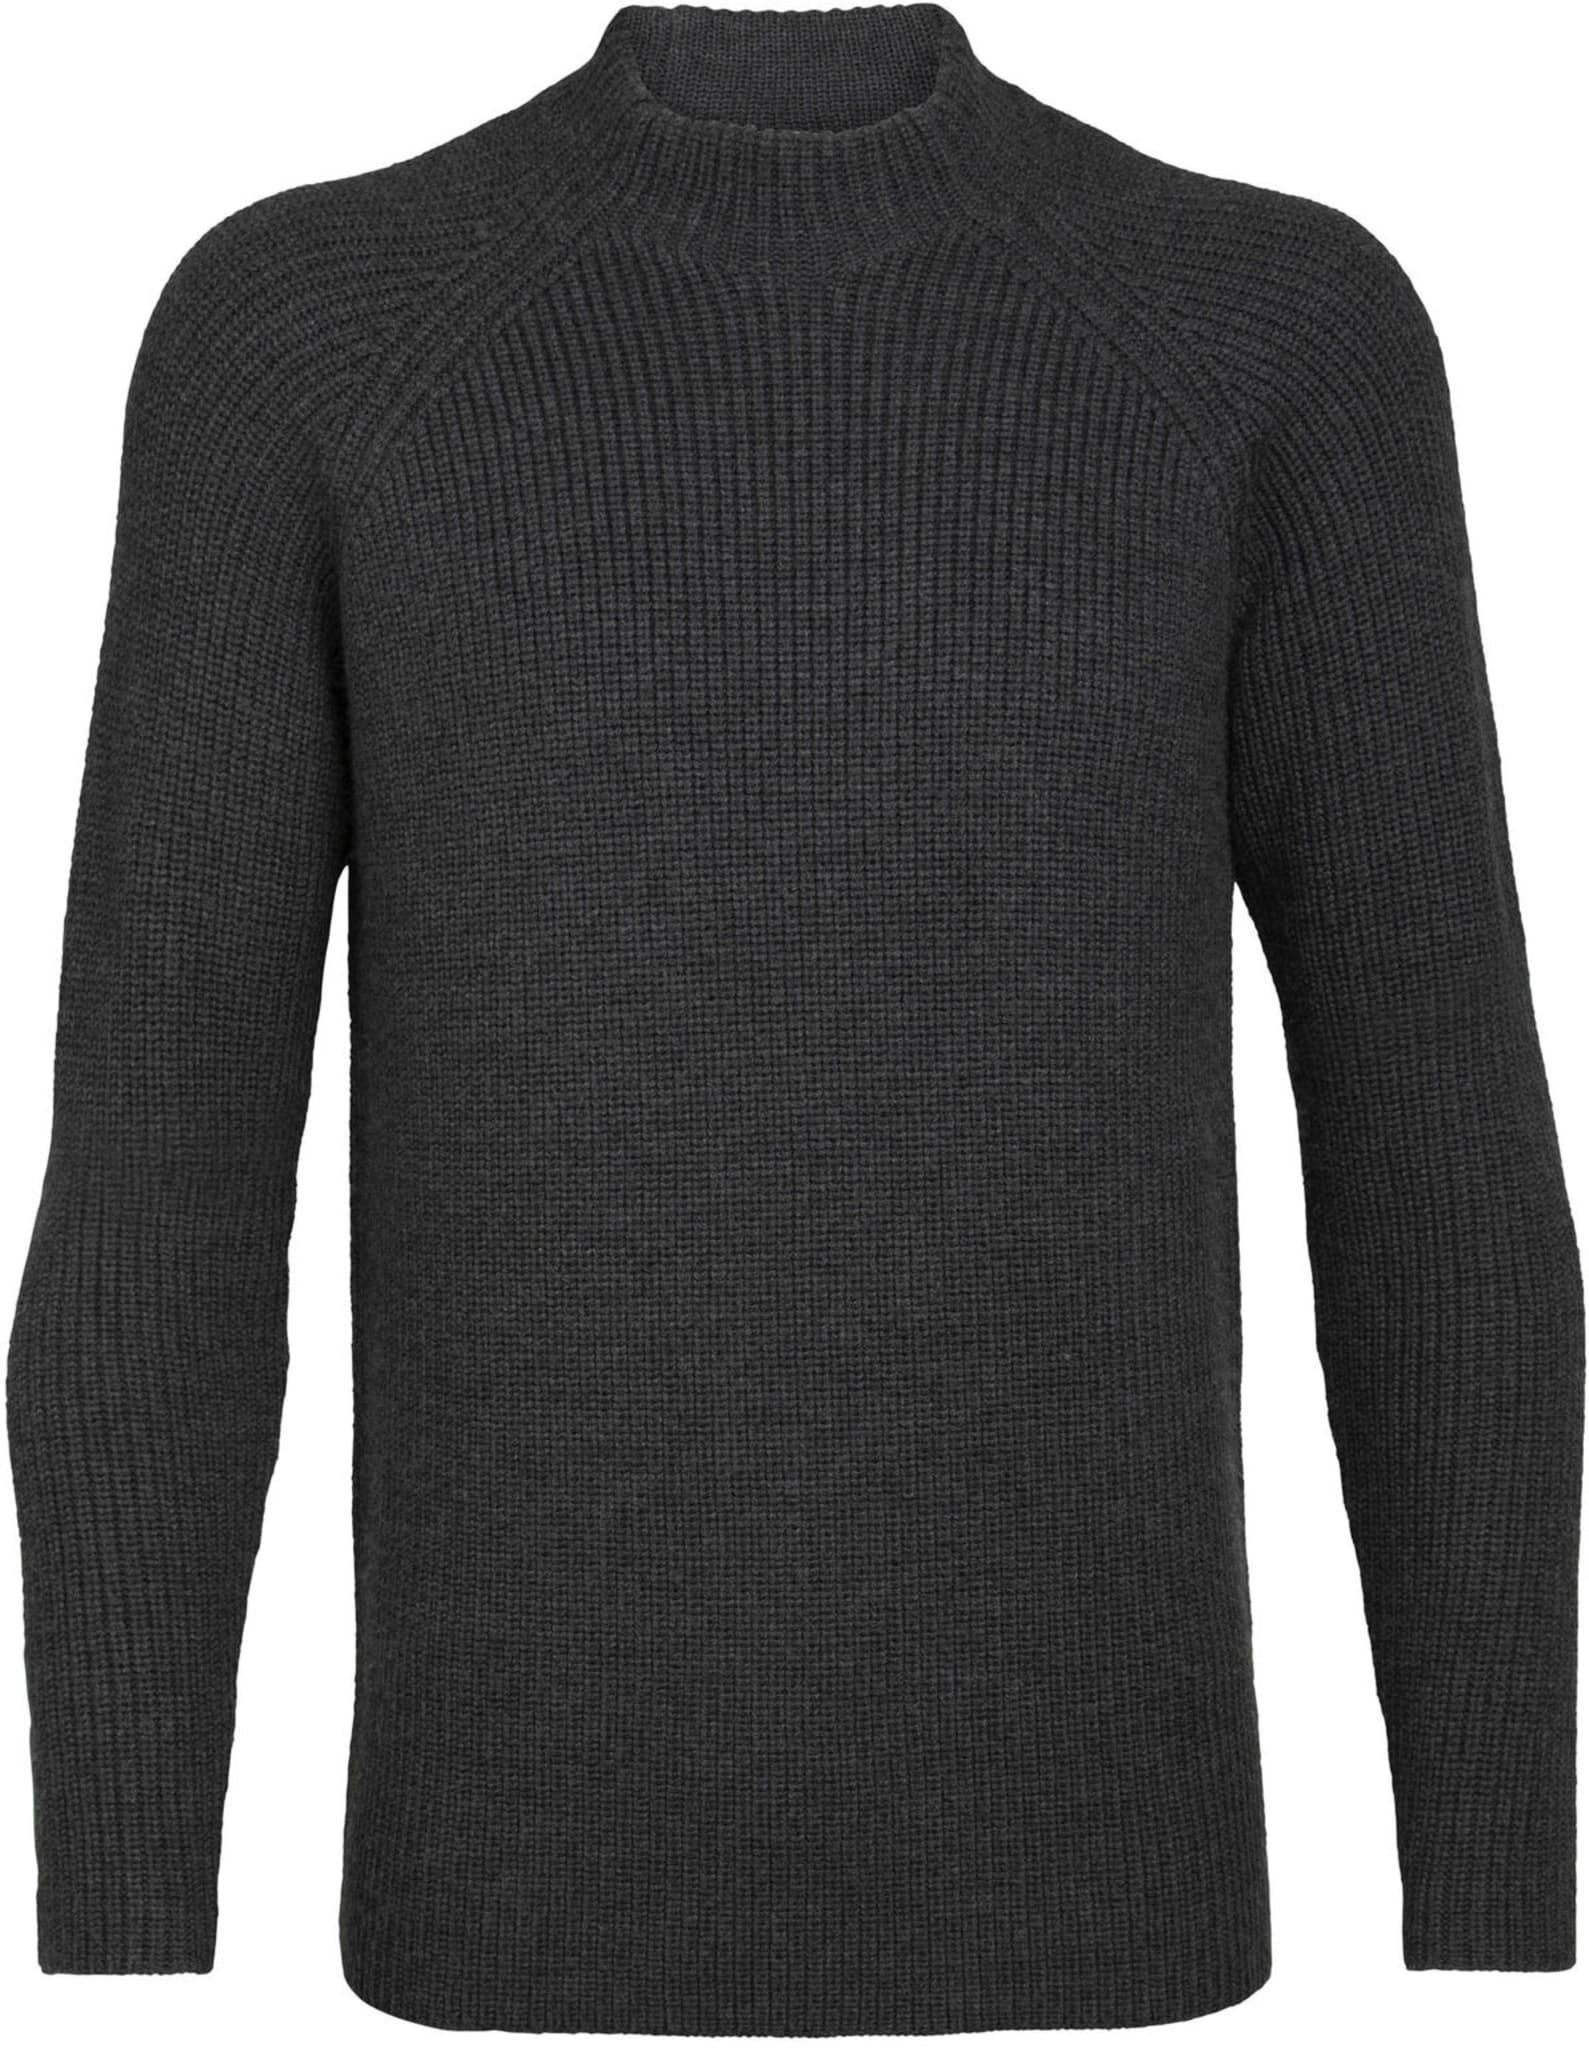 Casual genser i 100% merino